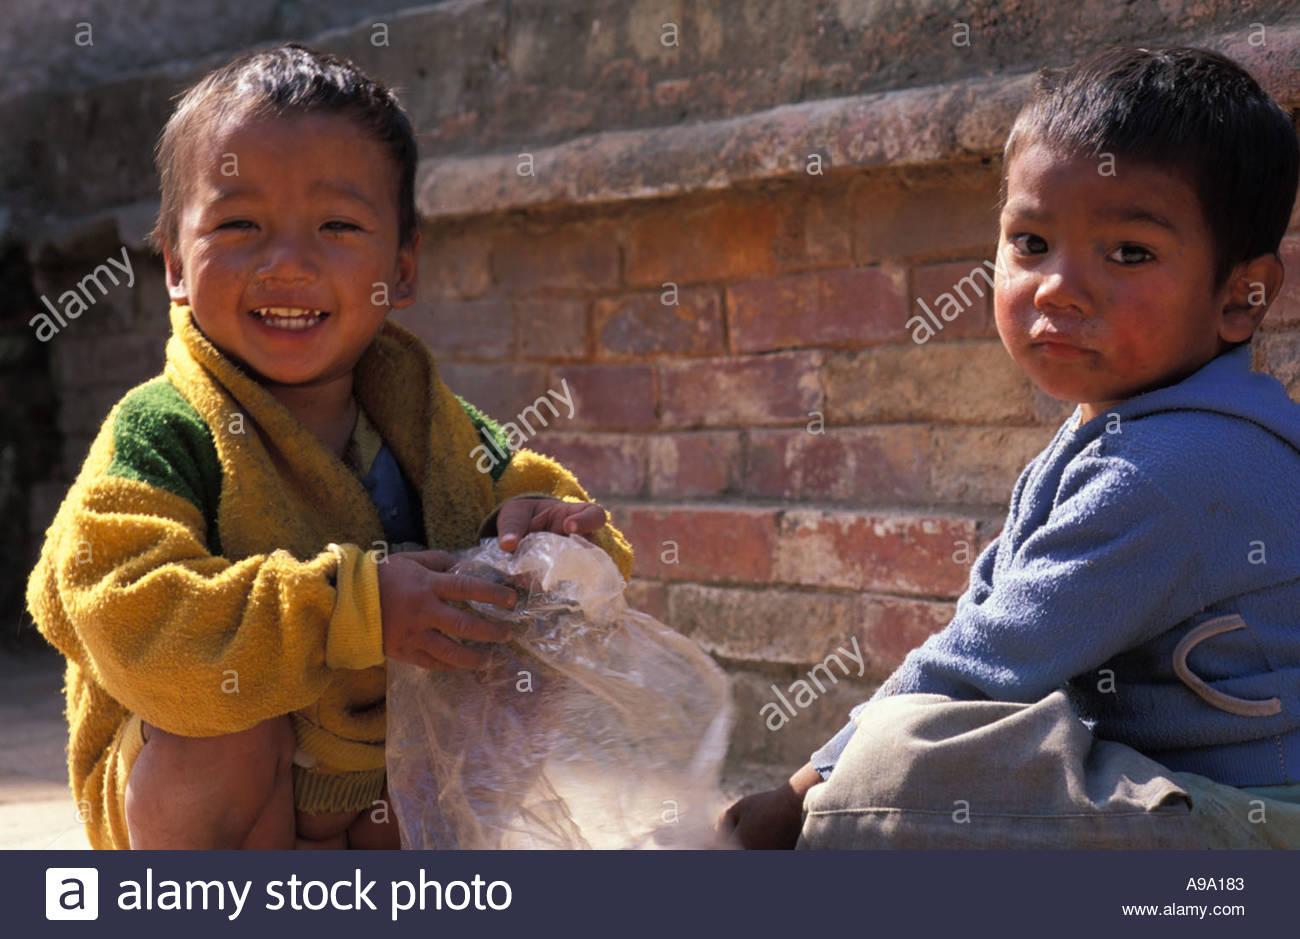 street children in kathmandu Drug use is problem in nepal to protect street children or youth of nepal volunteer can make contribution through nepal drug awareness volunteering program.